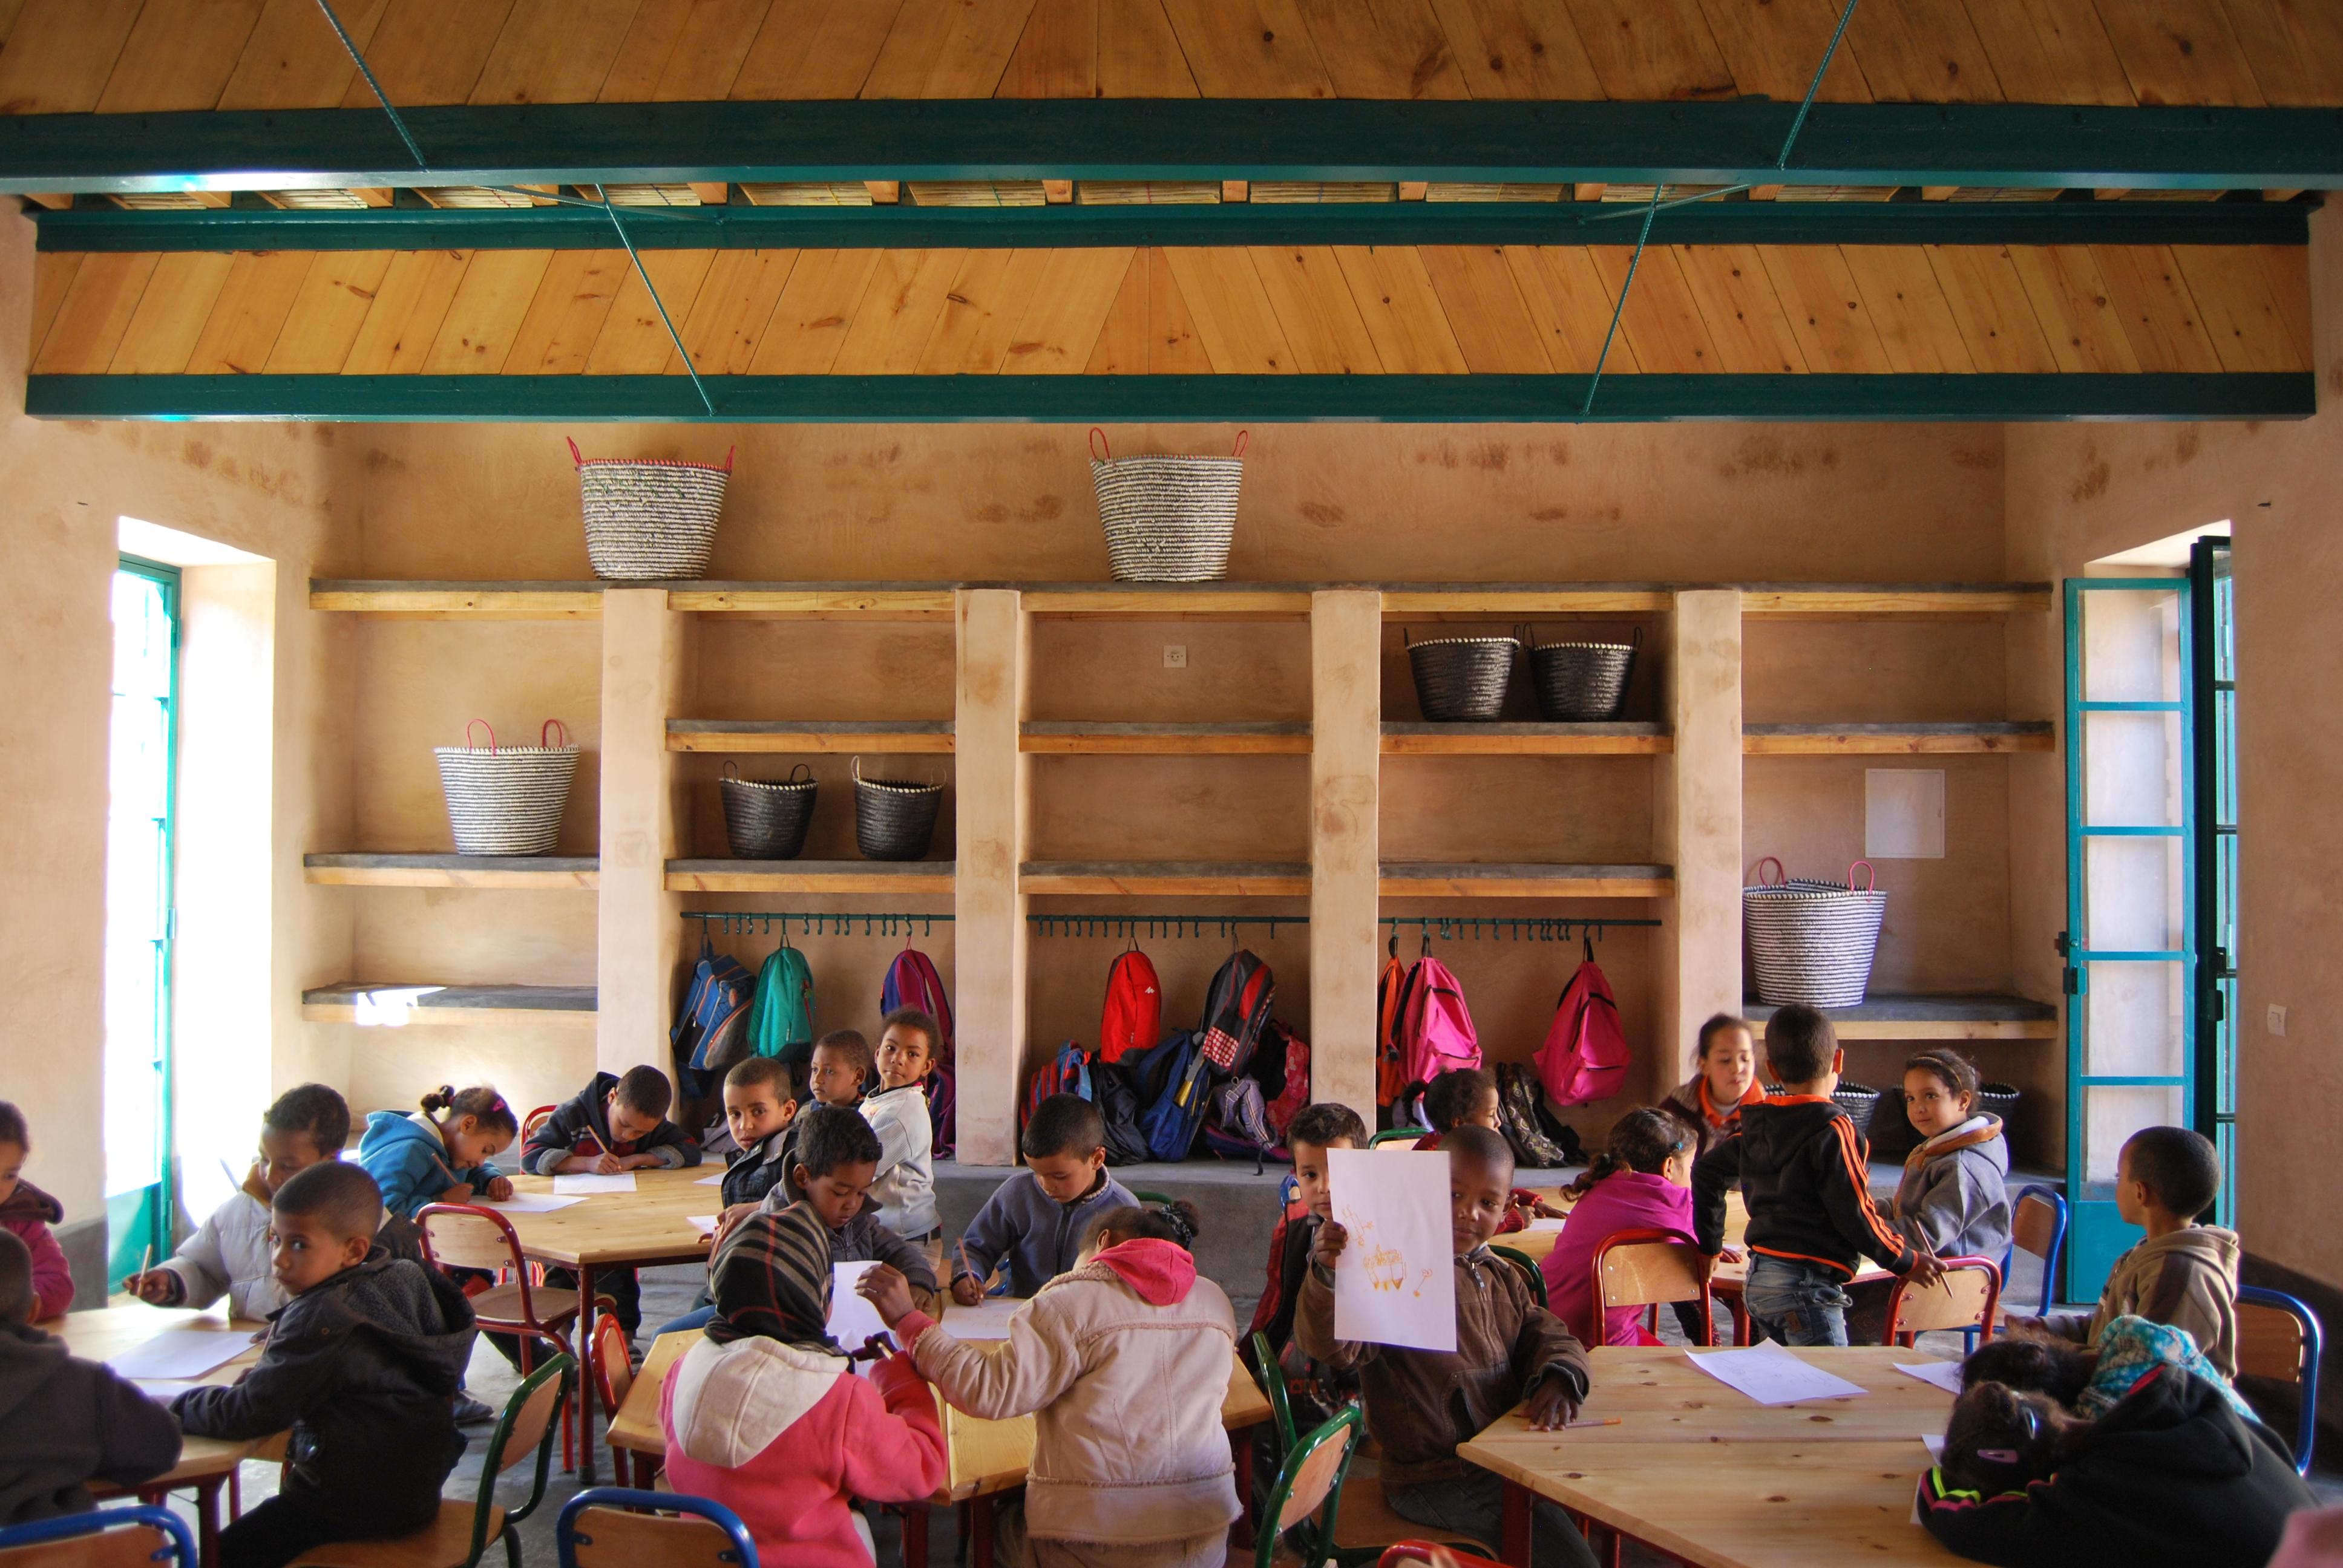 Kleuter- en basisschool, Ouled Merzoug, (c) BC architects & studies